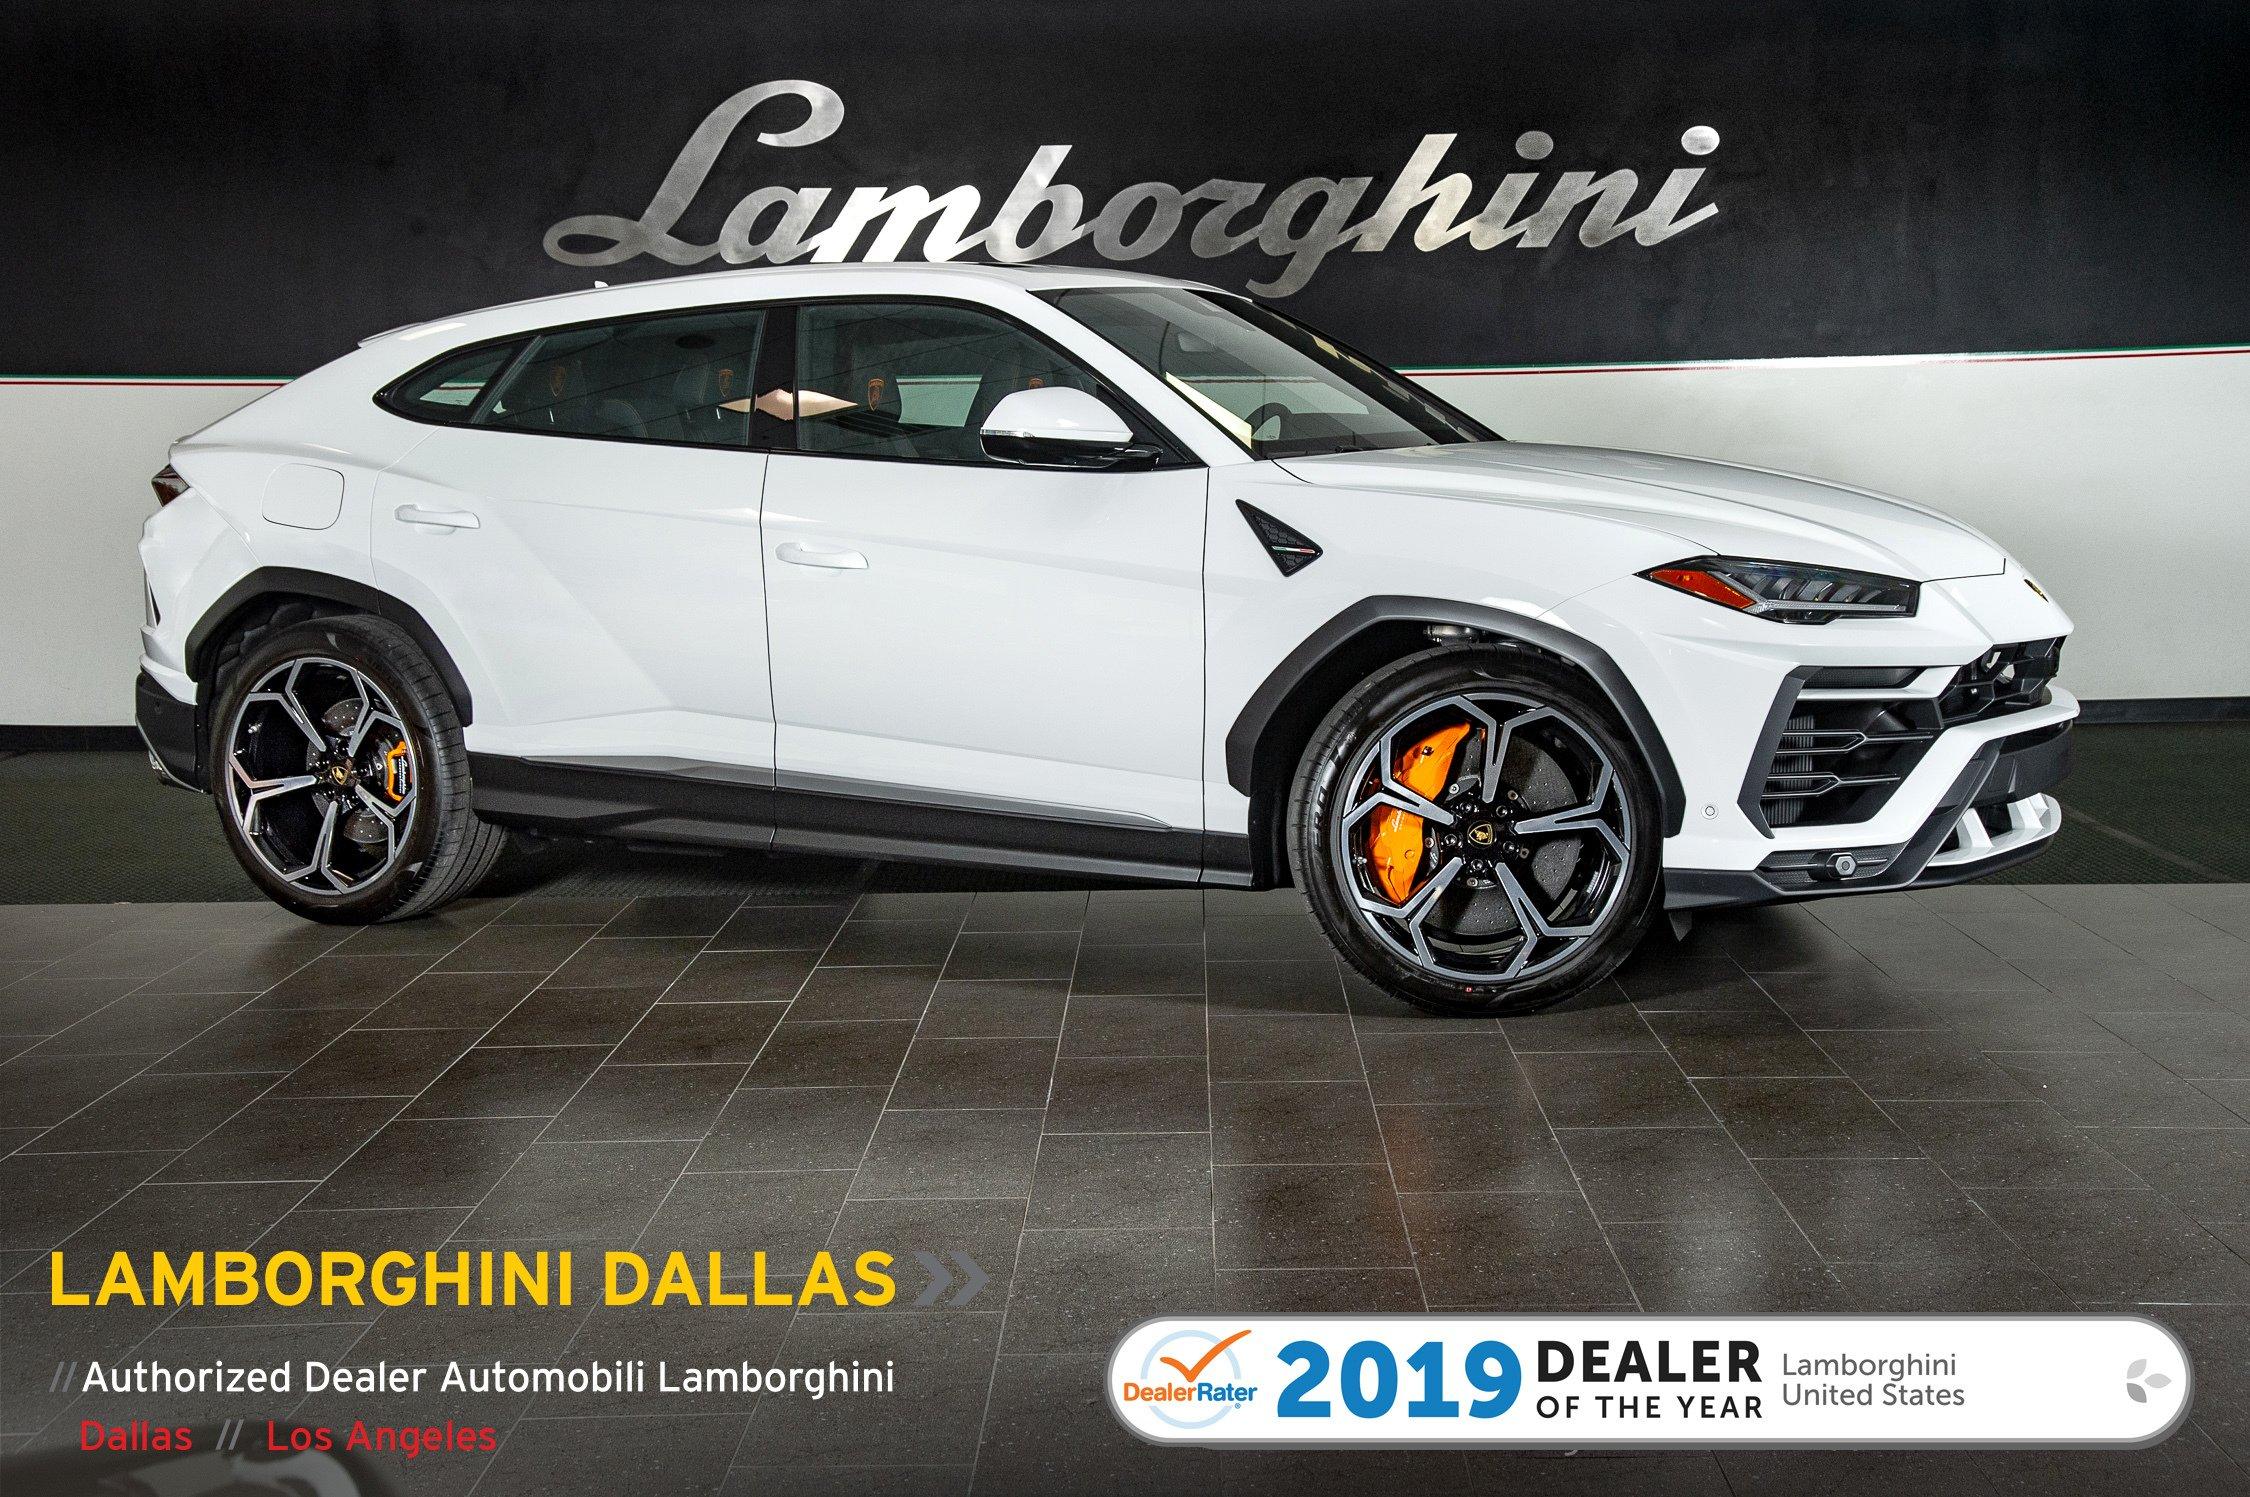 Used 2019 Lamborghini Urus For Sale Richardson,TX